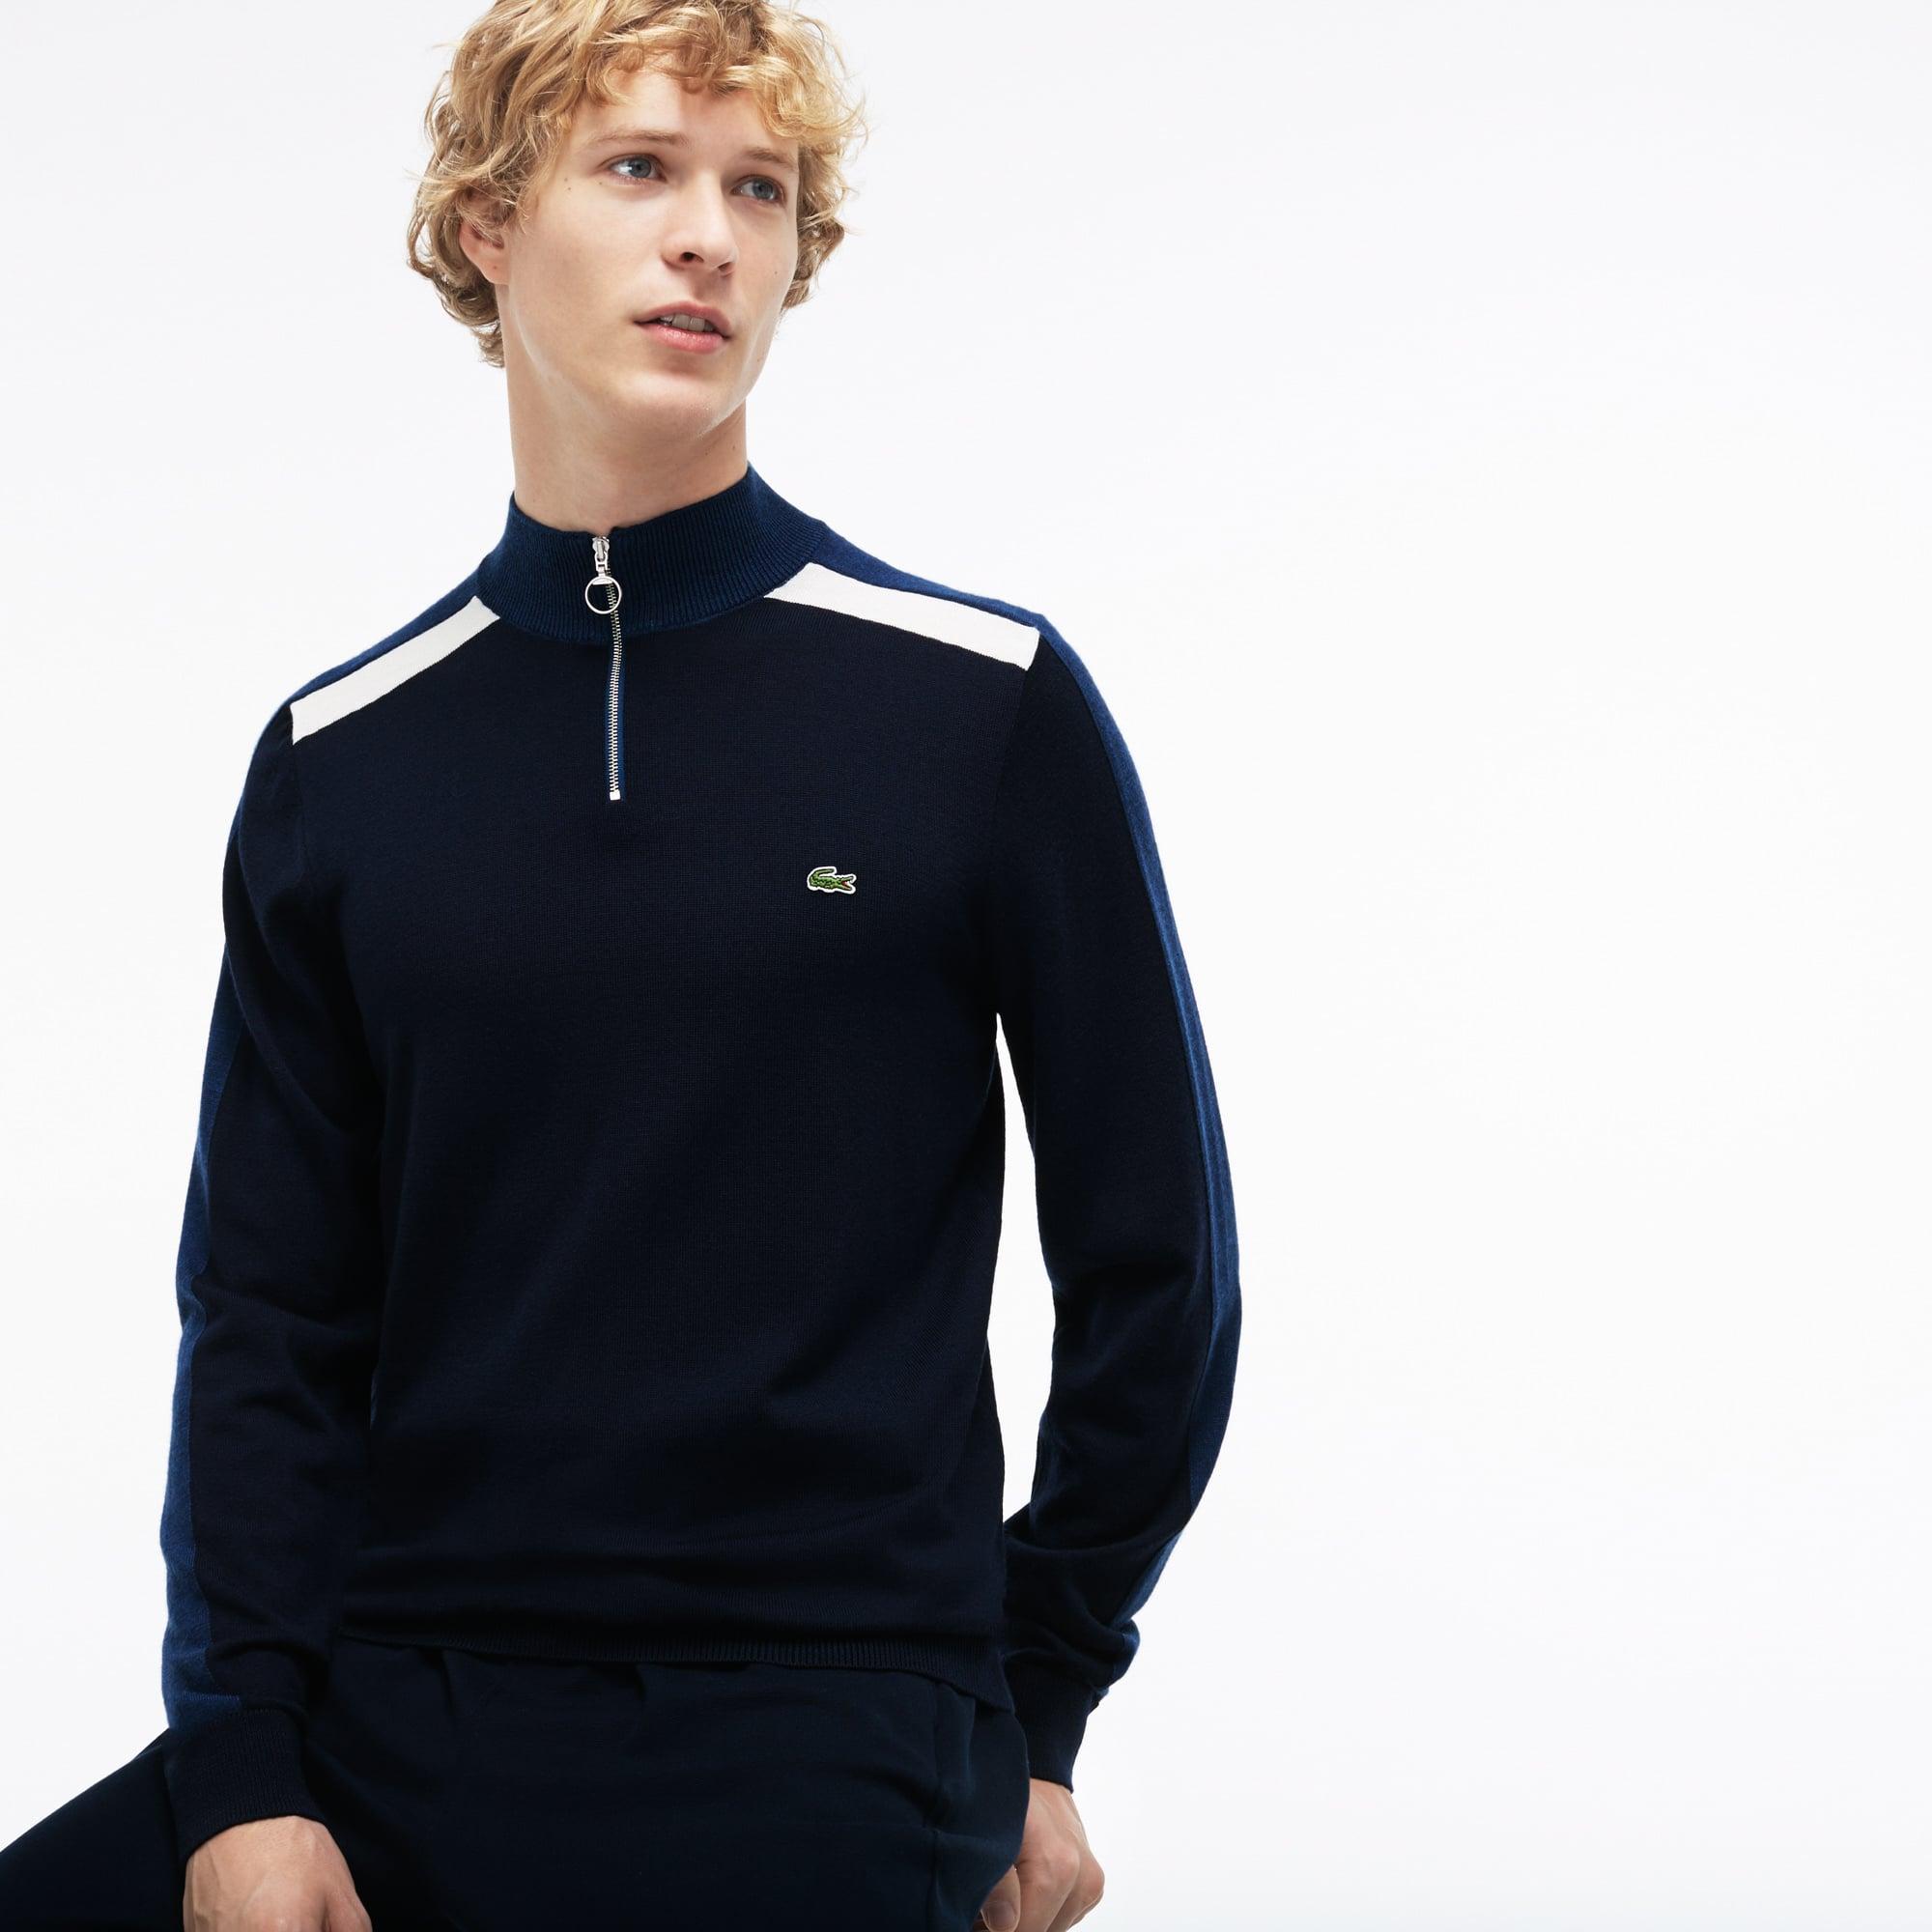 Sweater heren Made in France ritshals colorblock stroken jersey